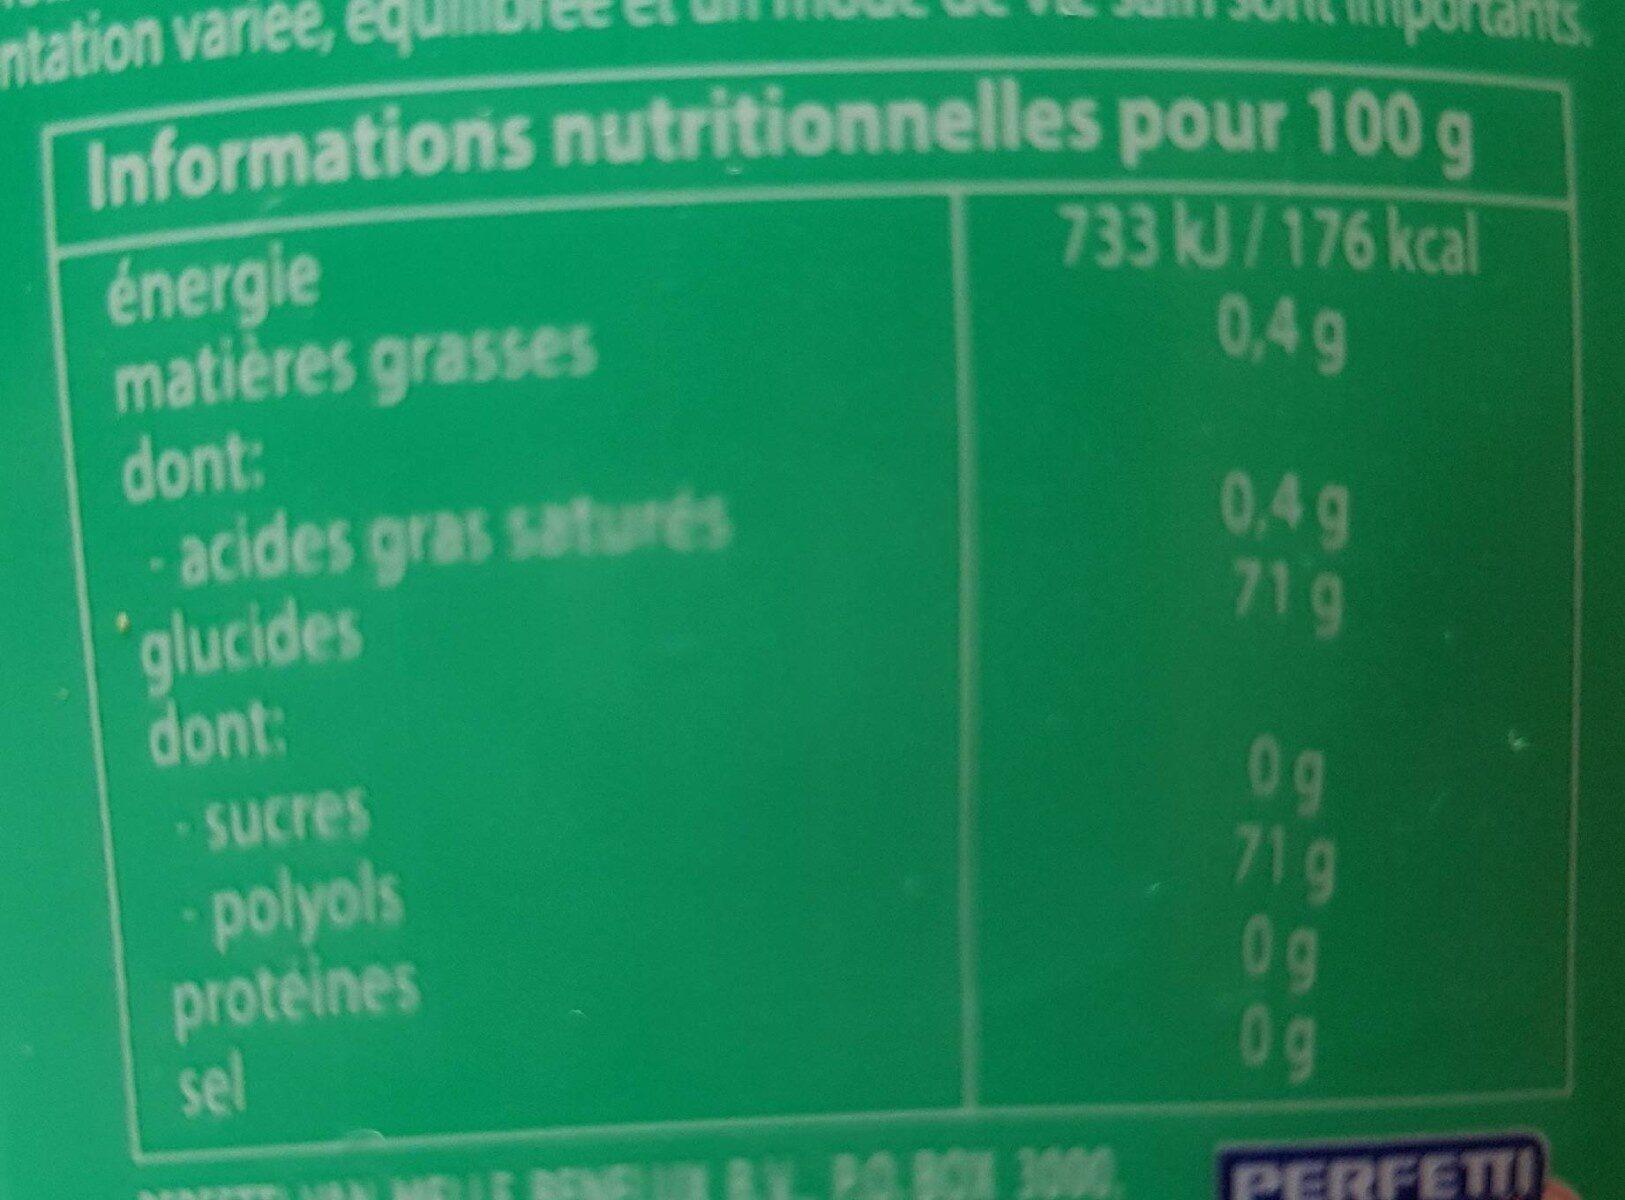 MENTOS ICE CUP - Informations nutritionnelles - en